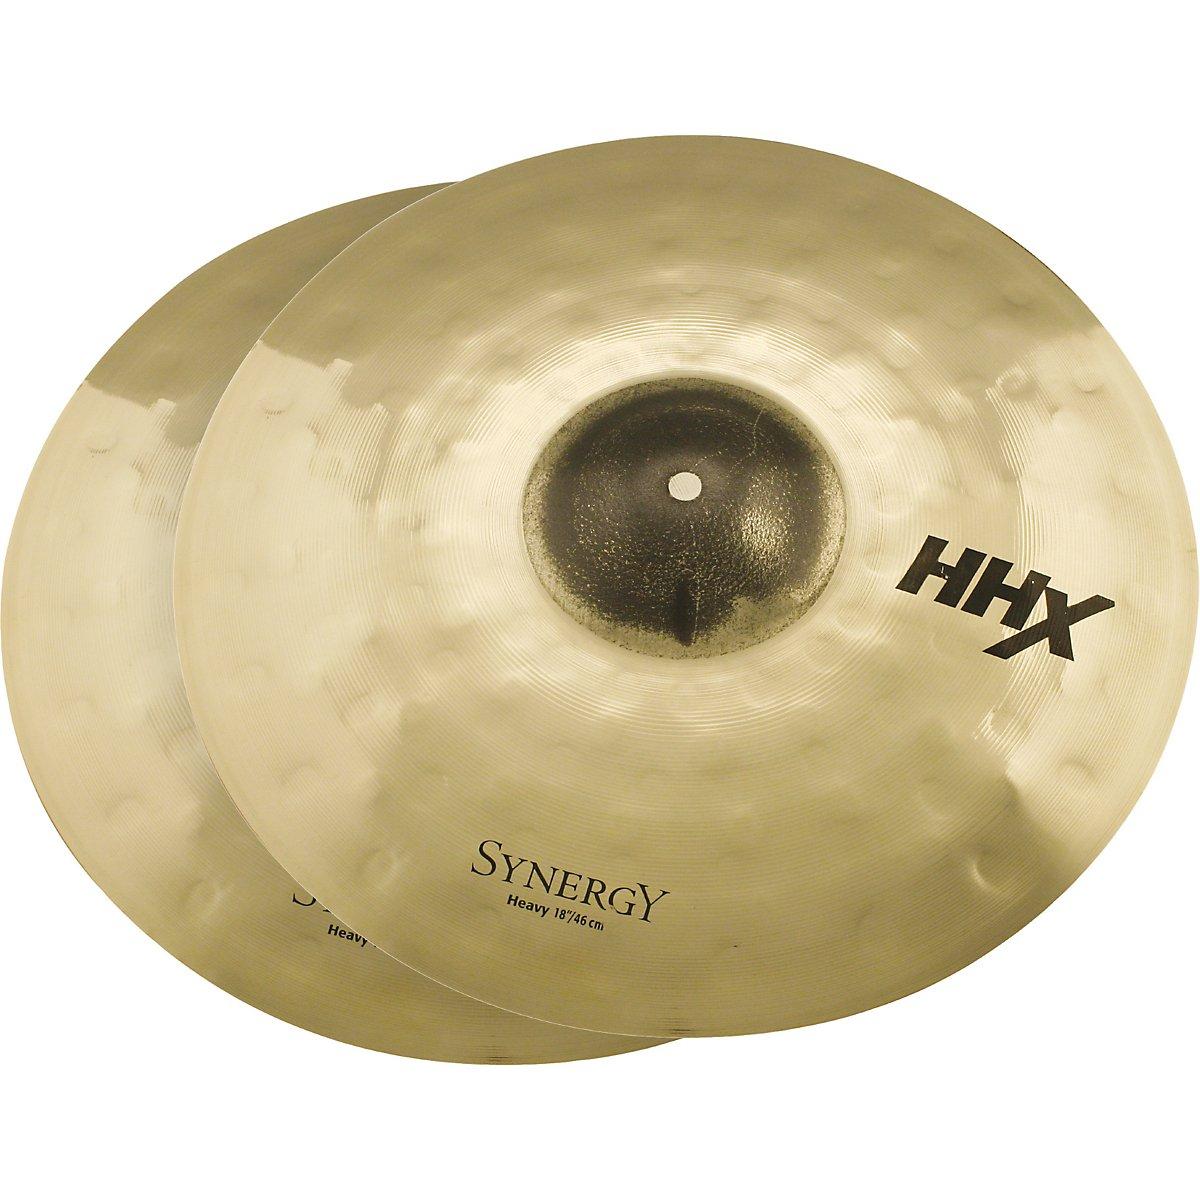 Sabian 21'' HHX Synergy Heavy, inch 12194XBH